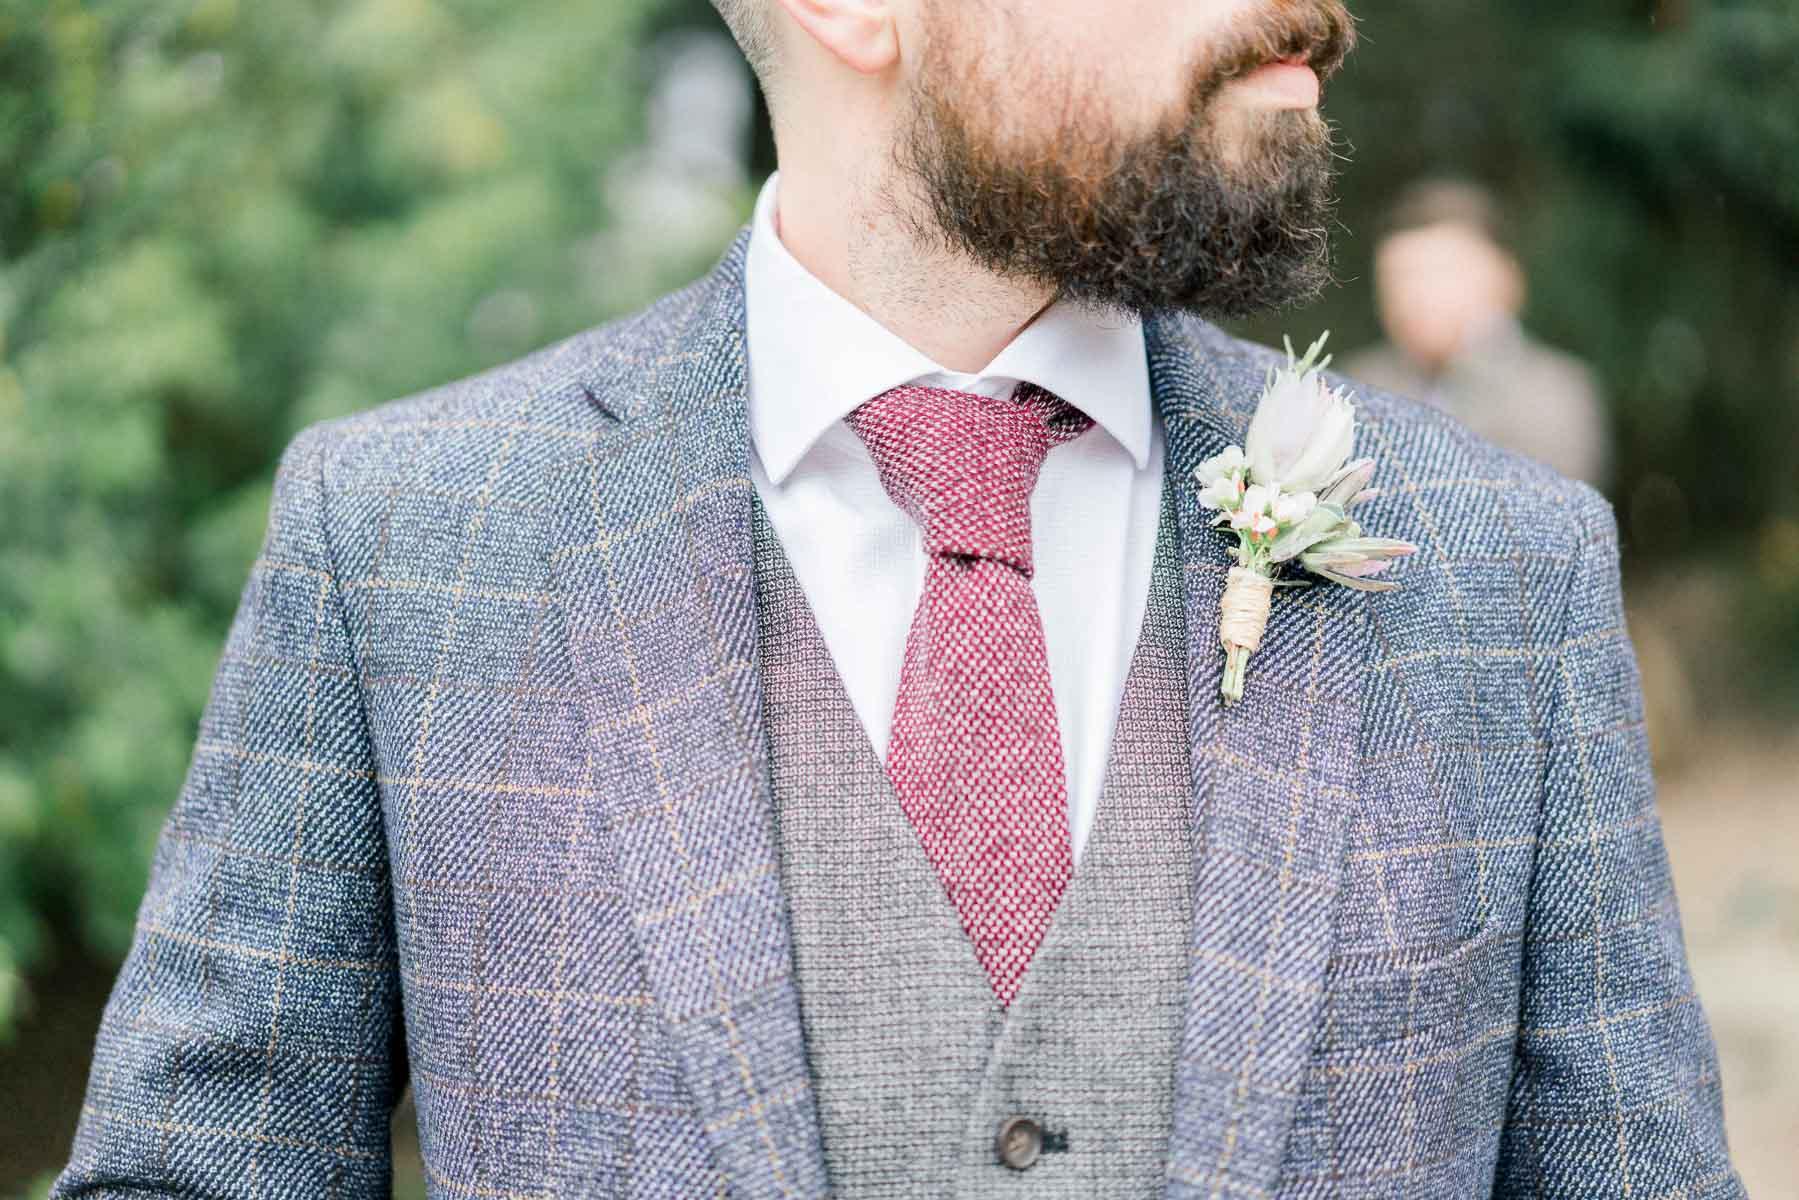 adams-farm-coldstream-yarra-valley-wedding-heart+soul-weddings-kel-jarryd-04708.jpg